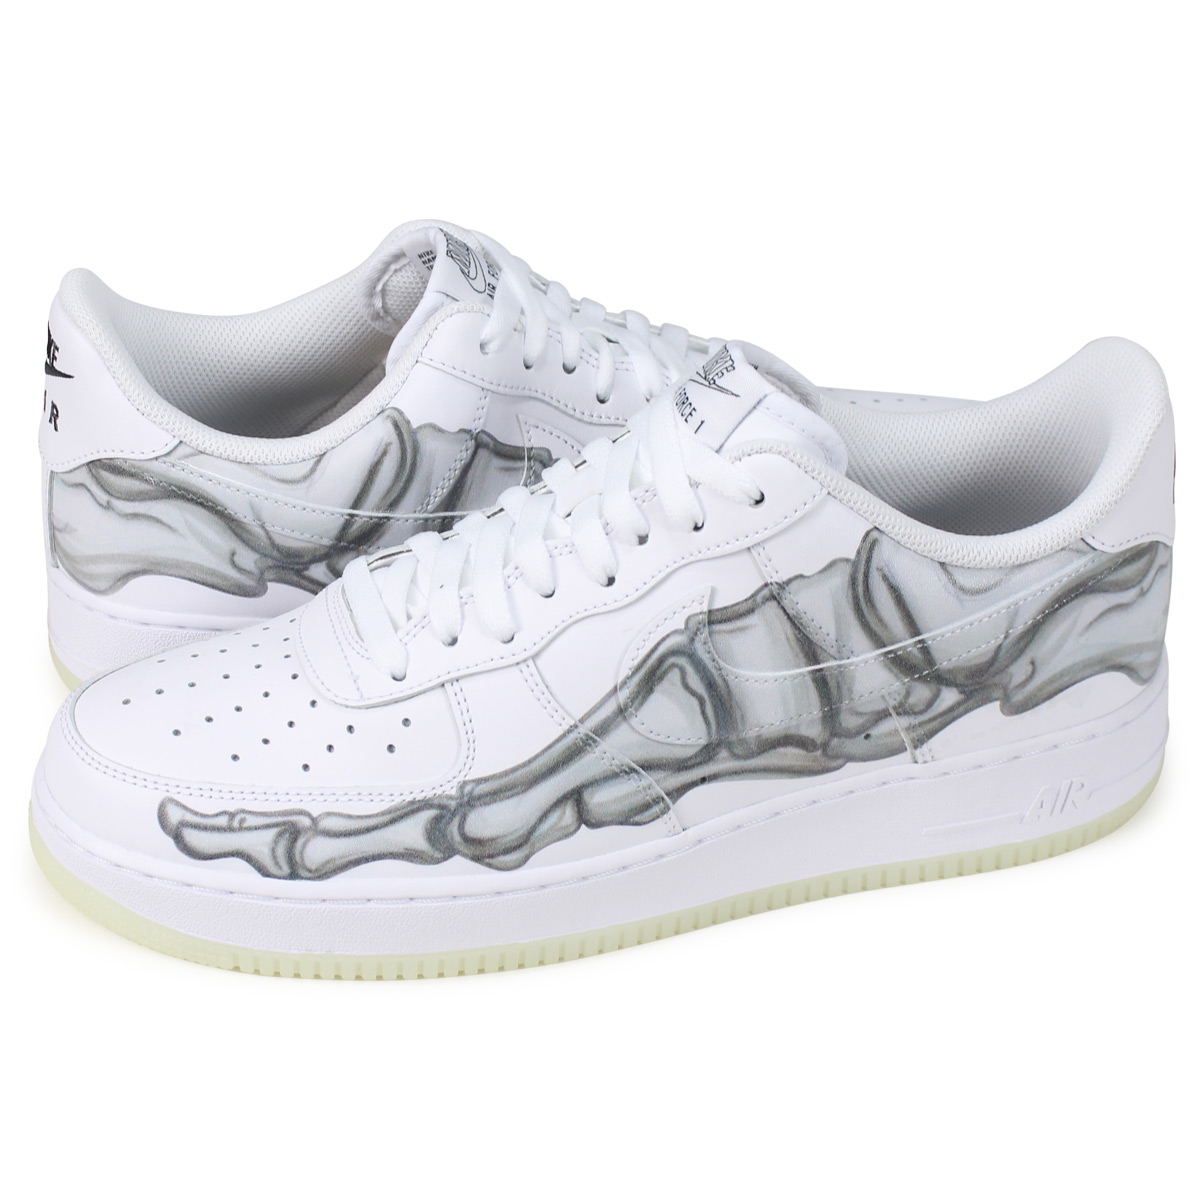 Nike NIKE air force 1 sneakers men AIR FORCE 1 SKELETON QS white BQ7541 100 [1811]